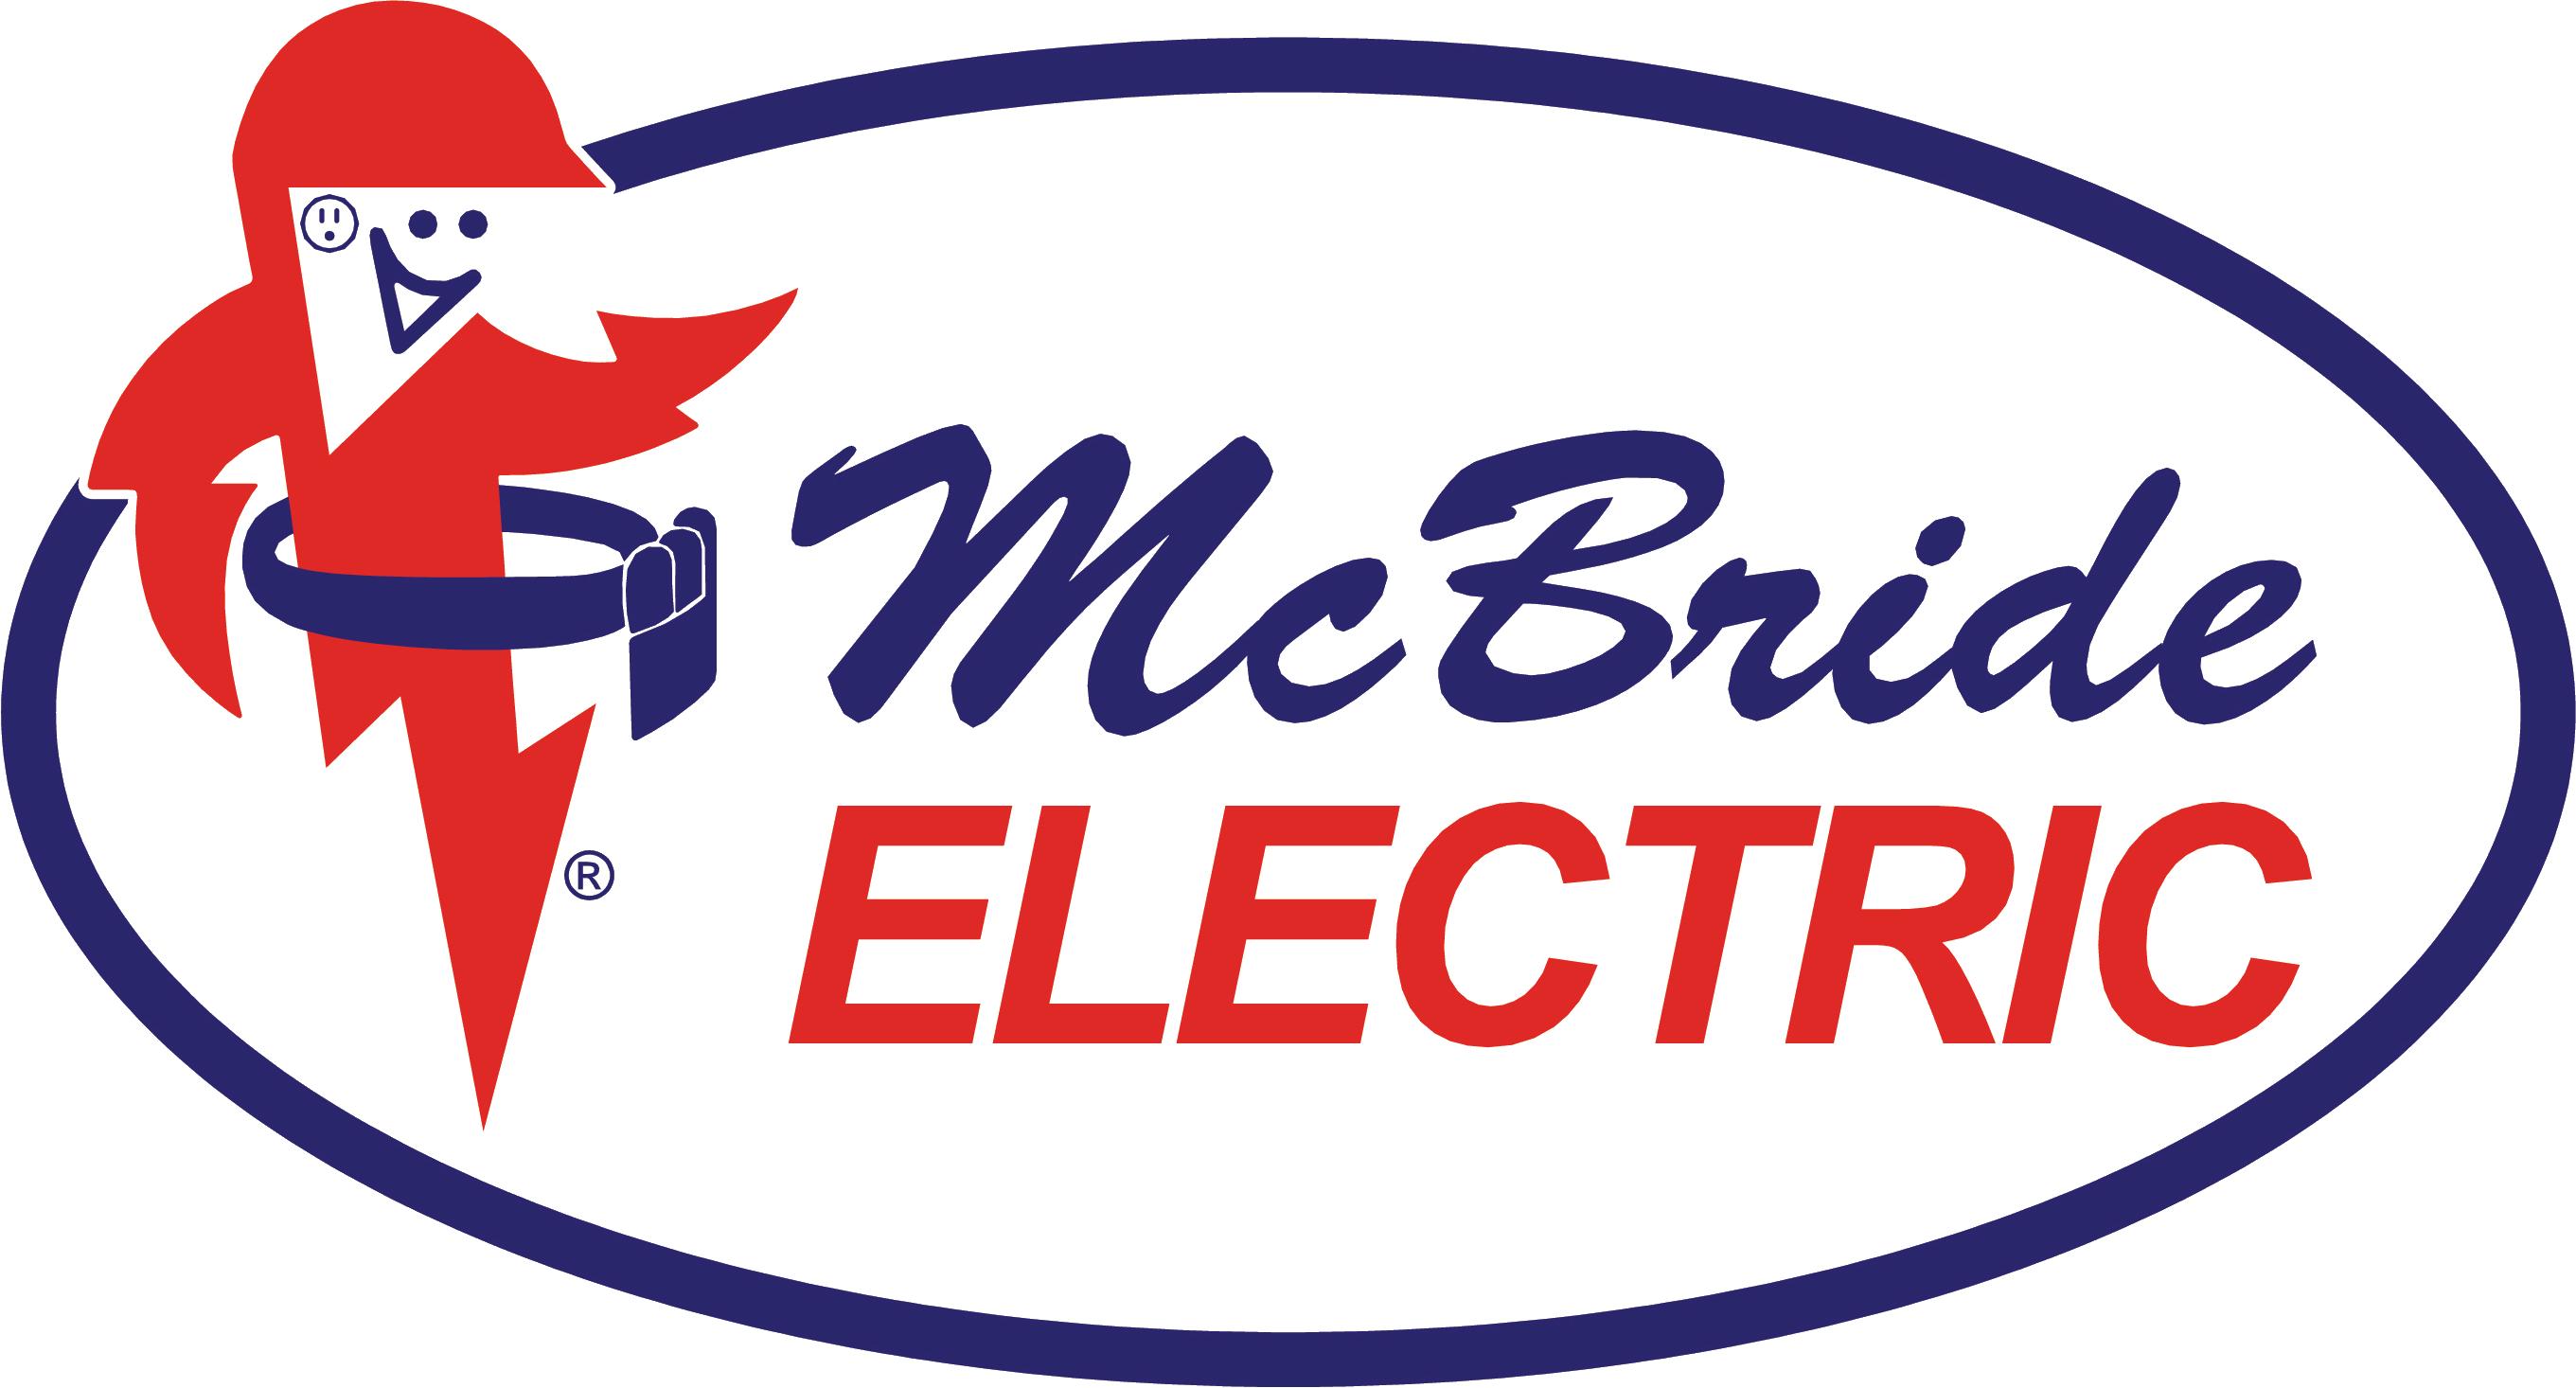 McBride Electric logo